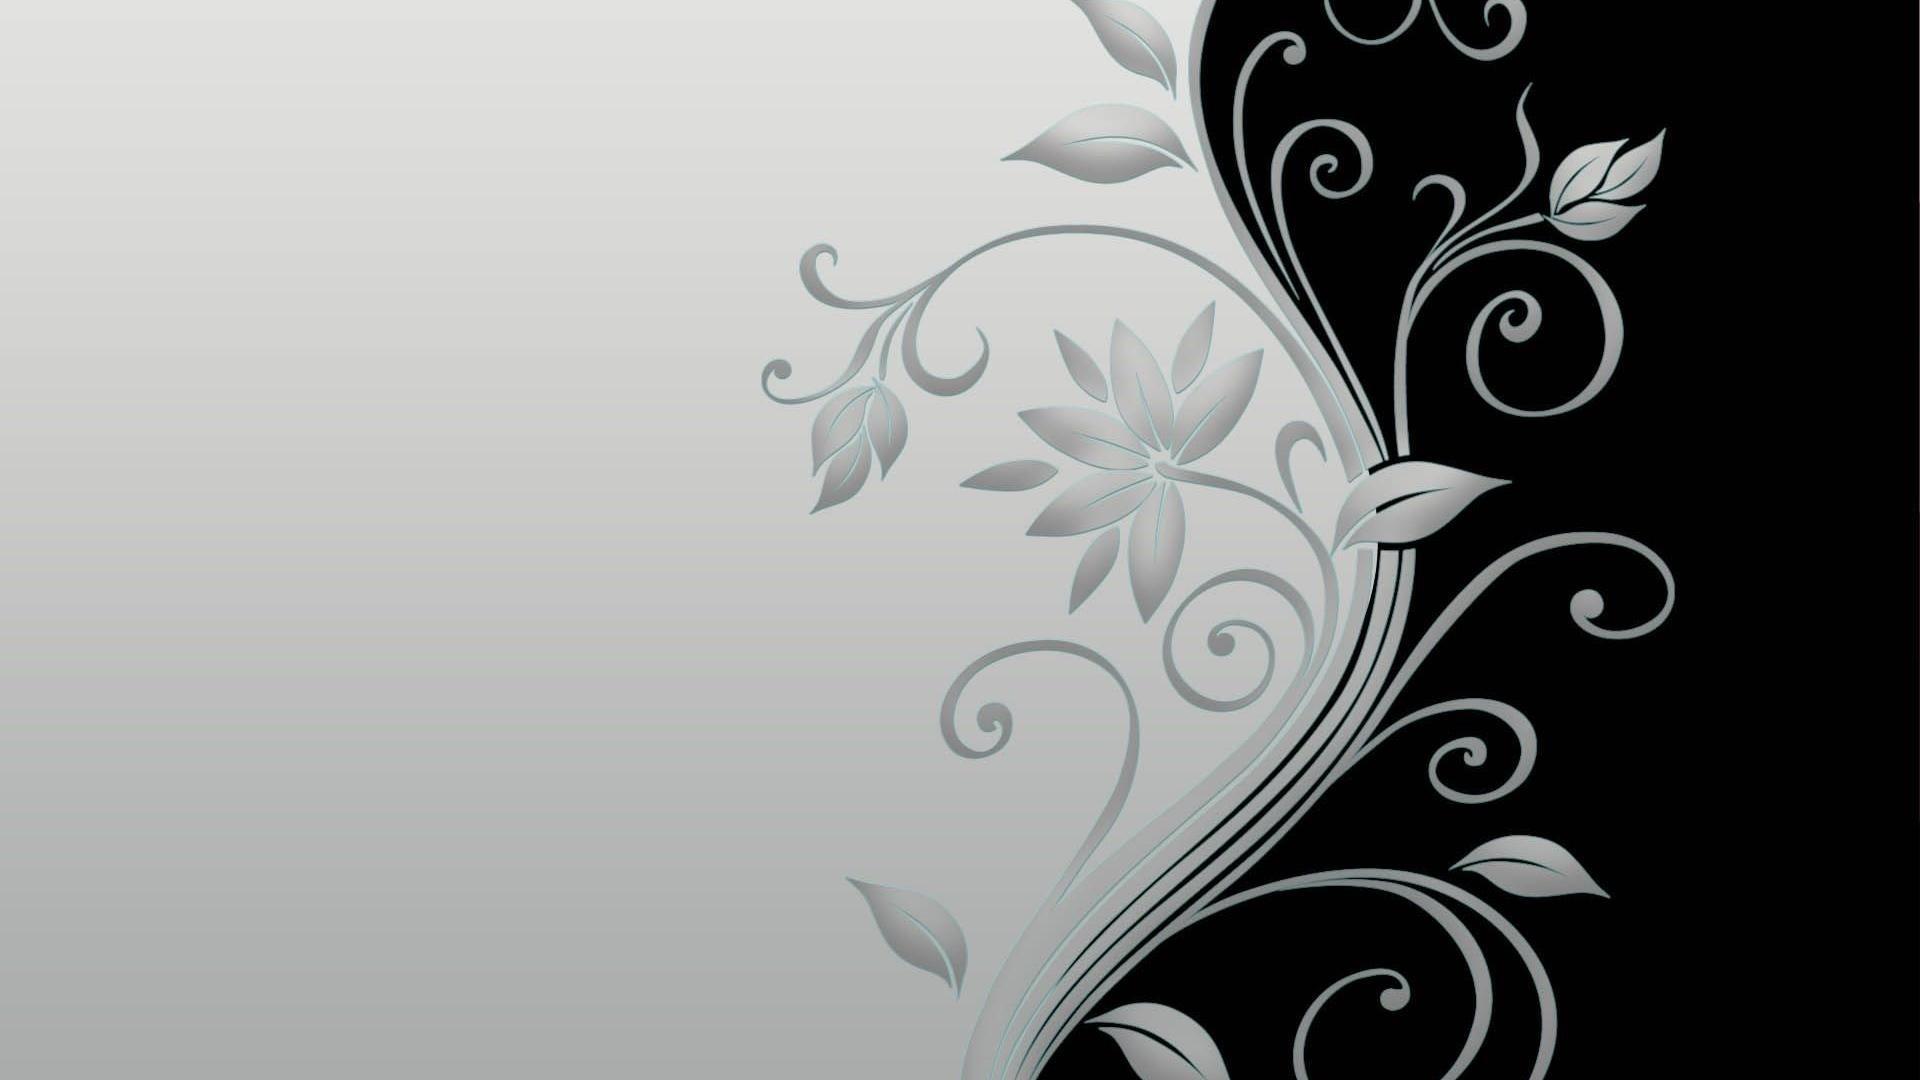 Flower Black and White HD Wallpaper Vector Flower Black and White 1920x1080